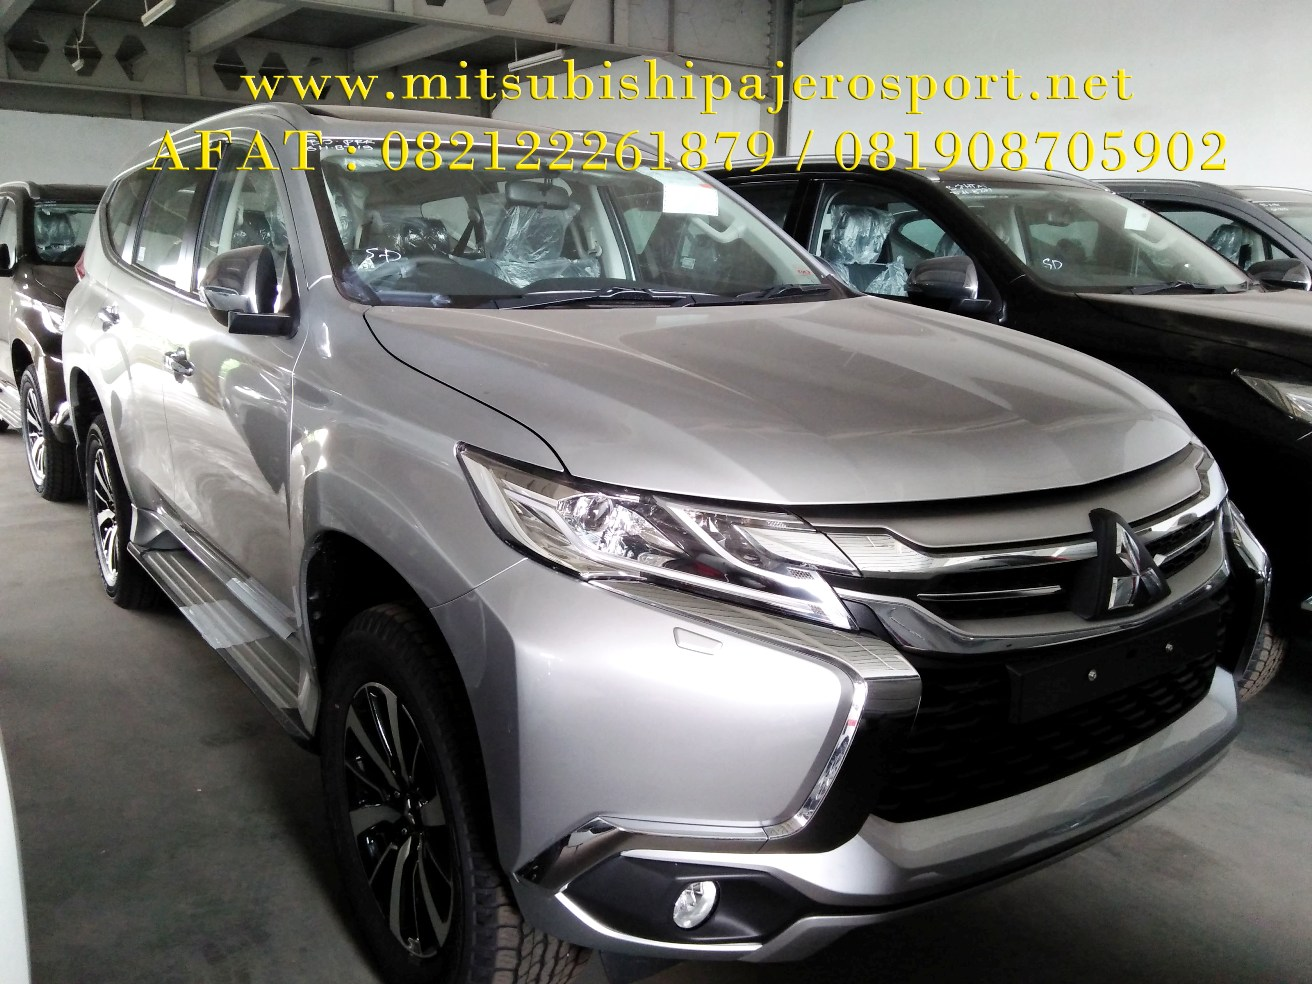 Dealer Resmi Mitsubishi Jakarta HARGA MITSUBISHI NEW PAJERO SPORT